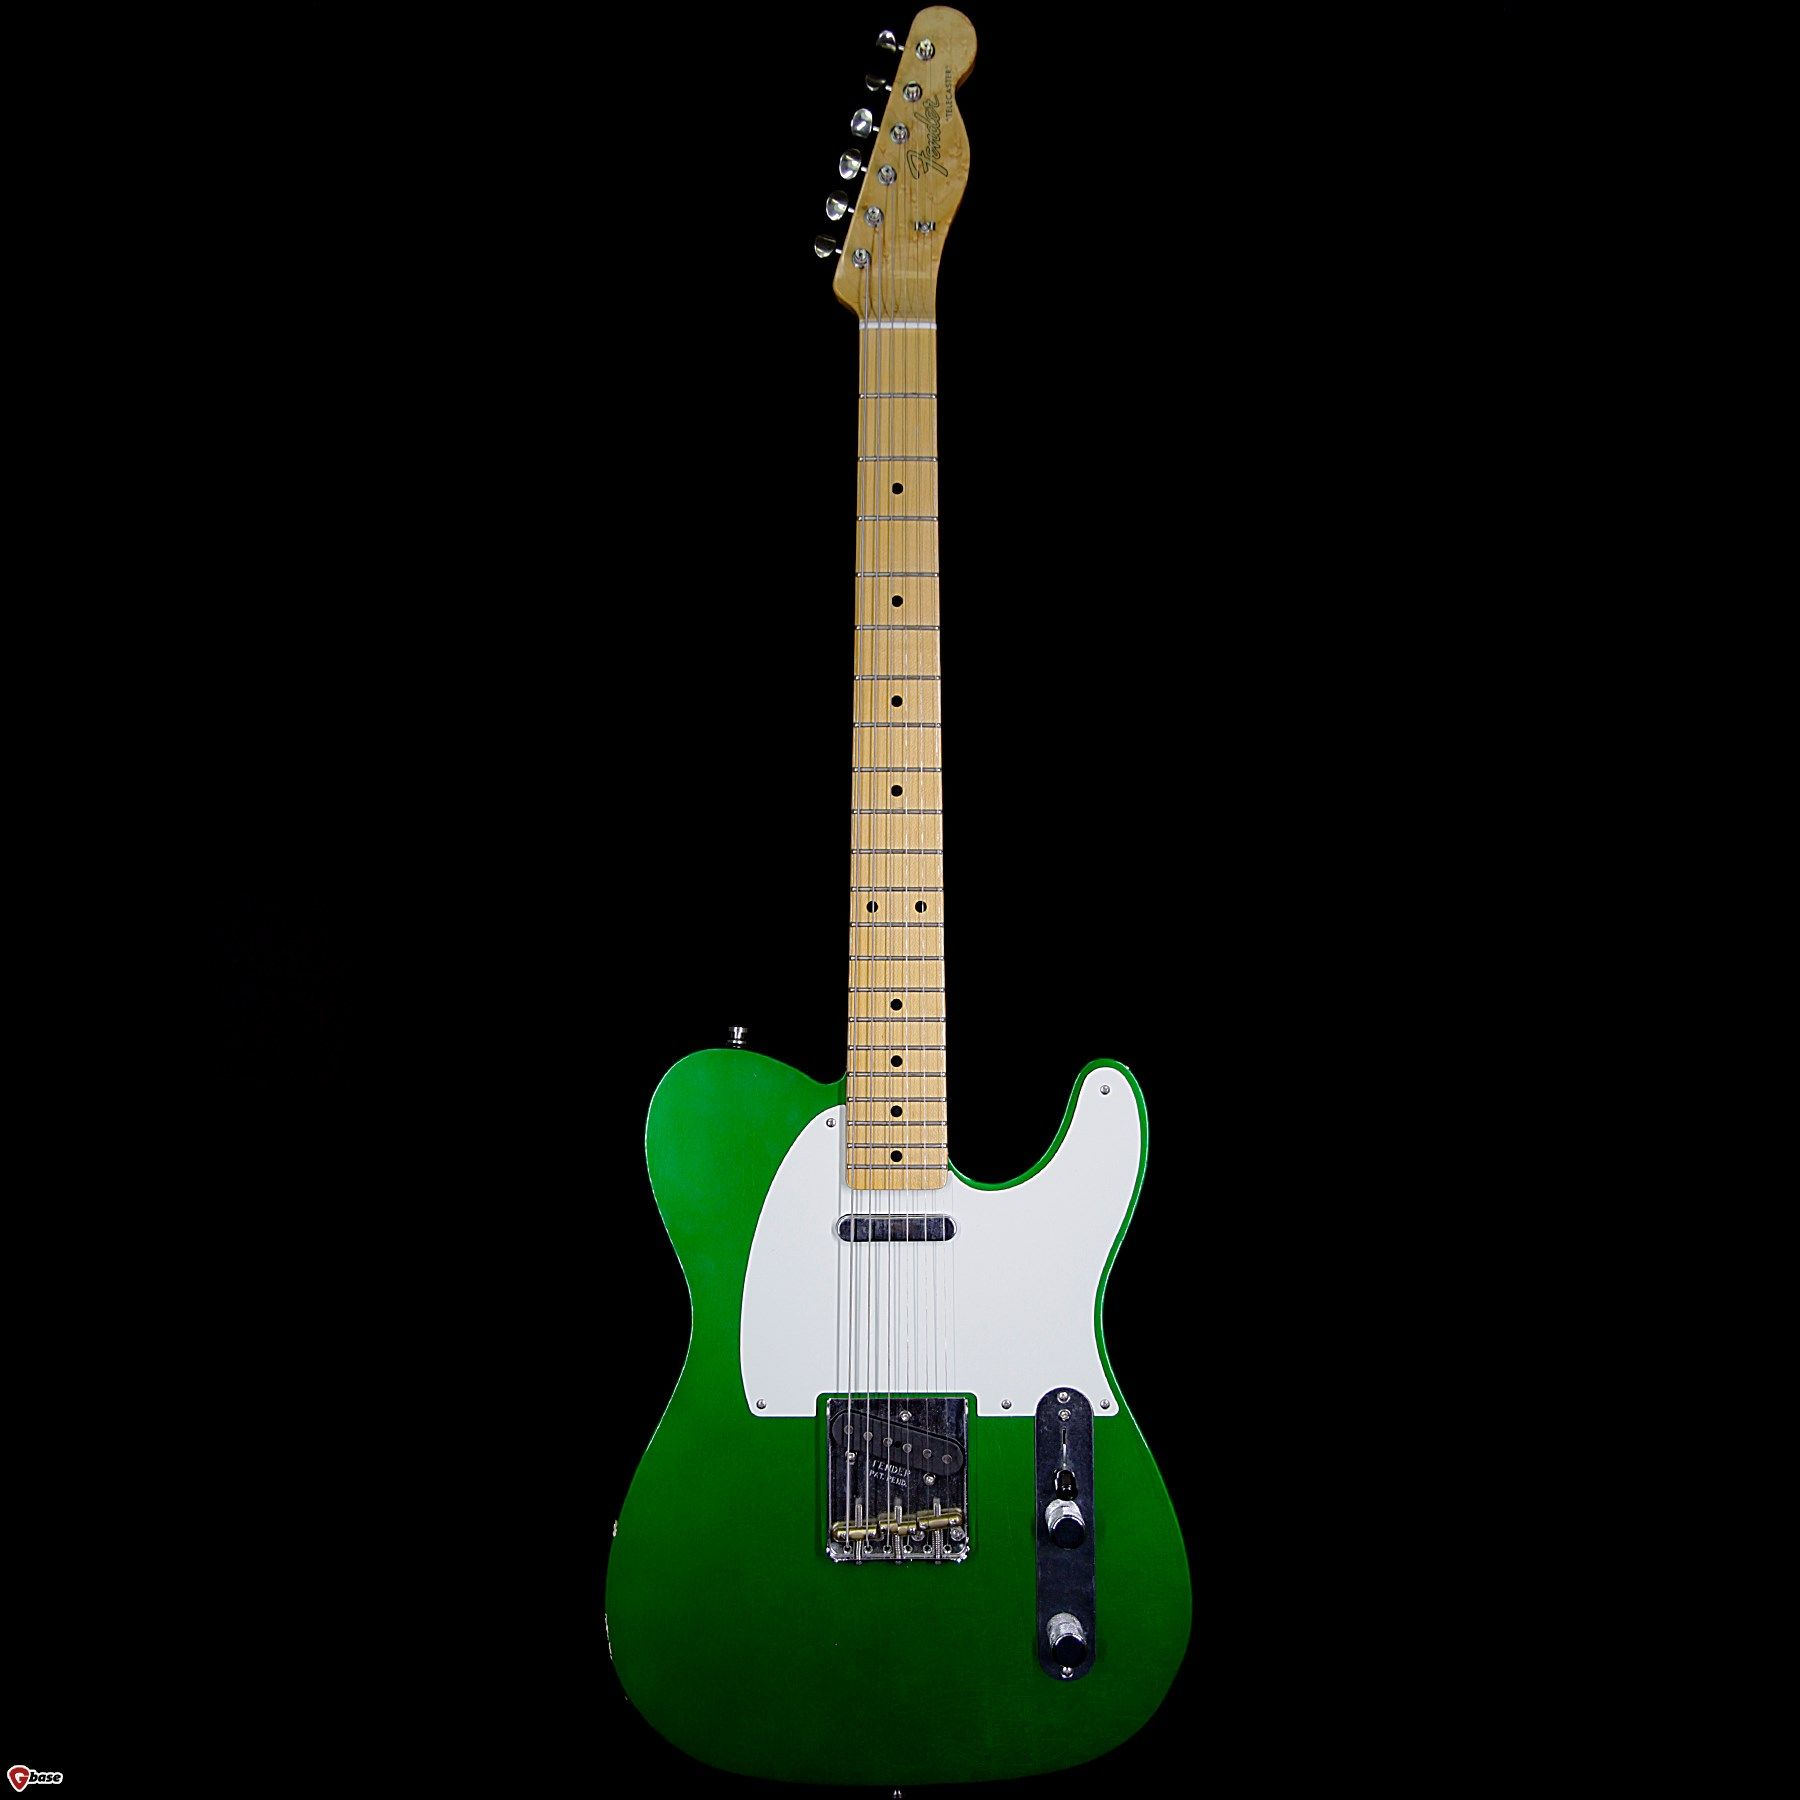 2017 Fender Custom Shop Wildwood 10 Postmodern Telecaster